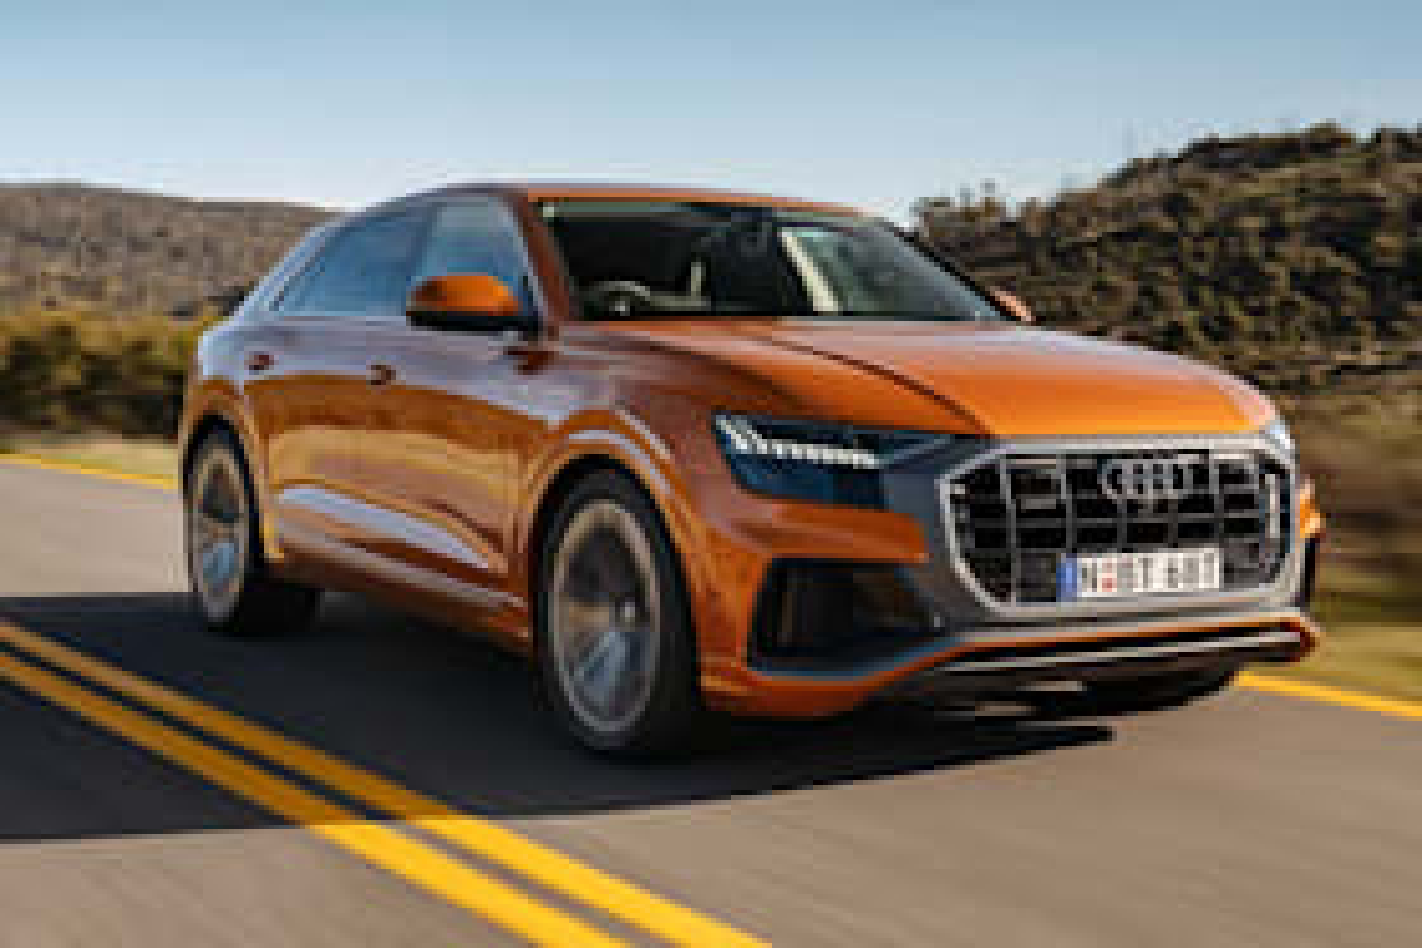 2019 Audi Q8 55TFSI quick performance review